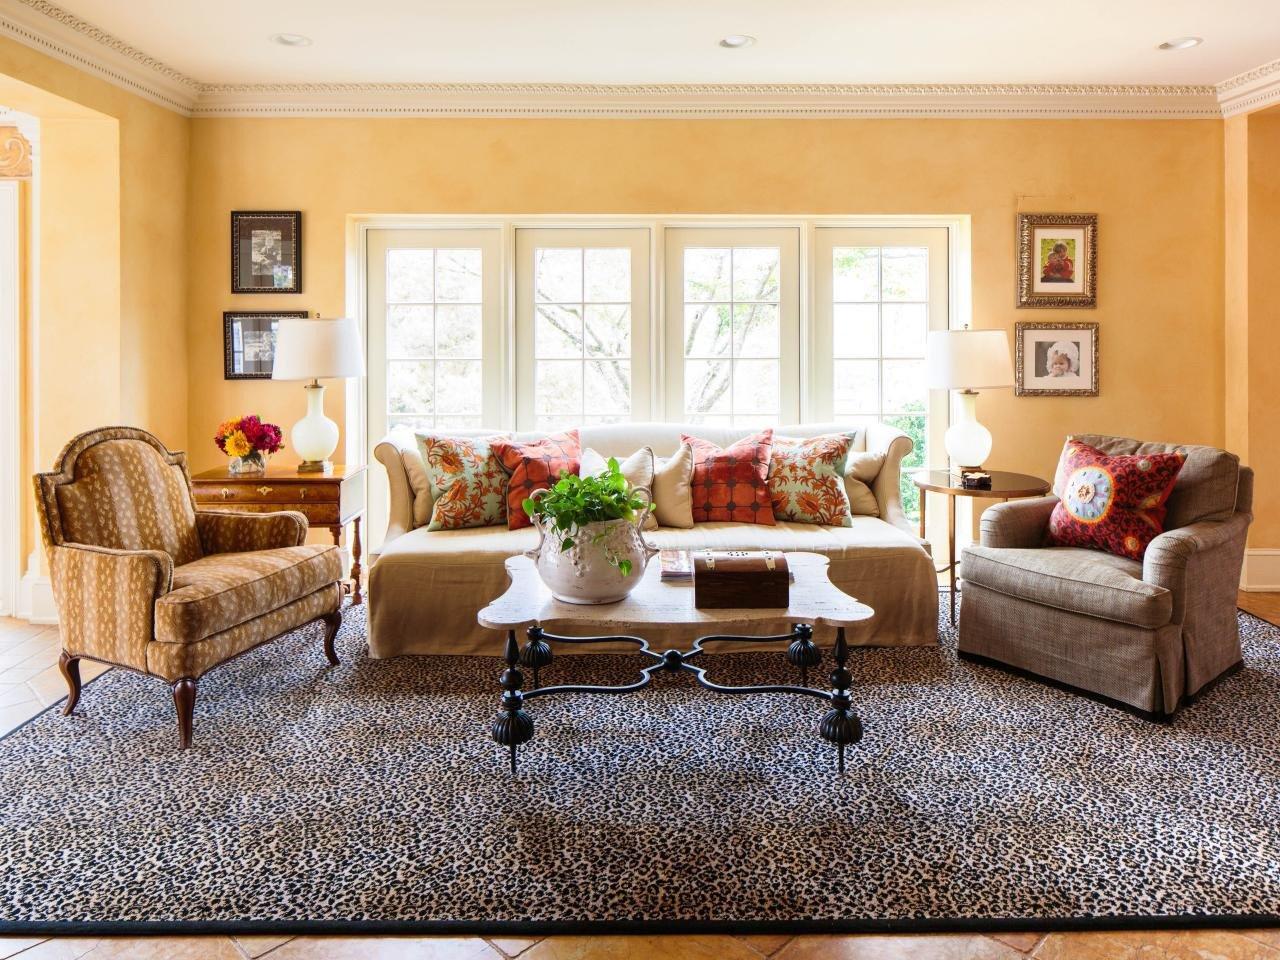 Leopard Decor for Living Room Leopard Print Living Room Decor Zion Star